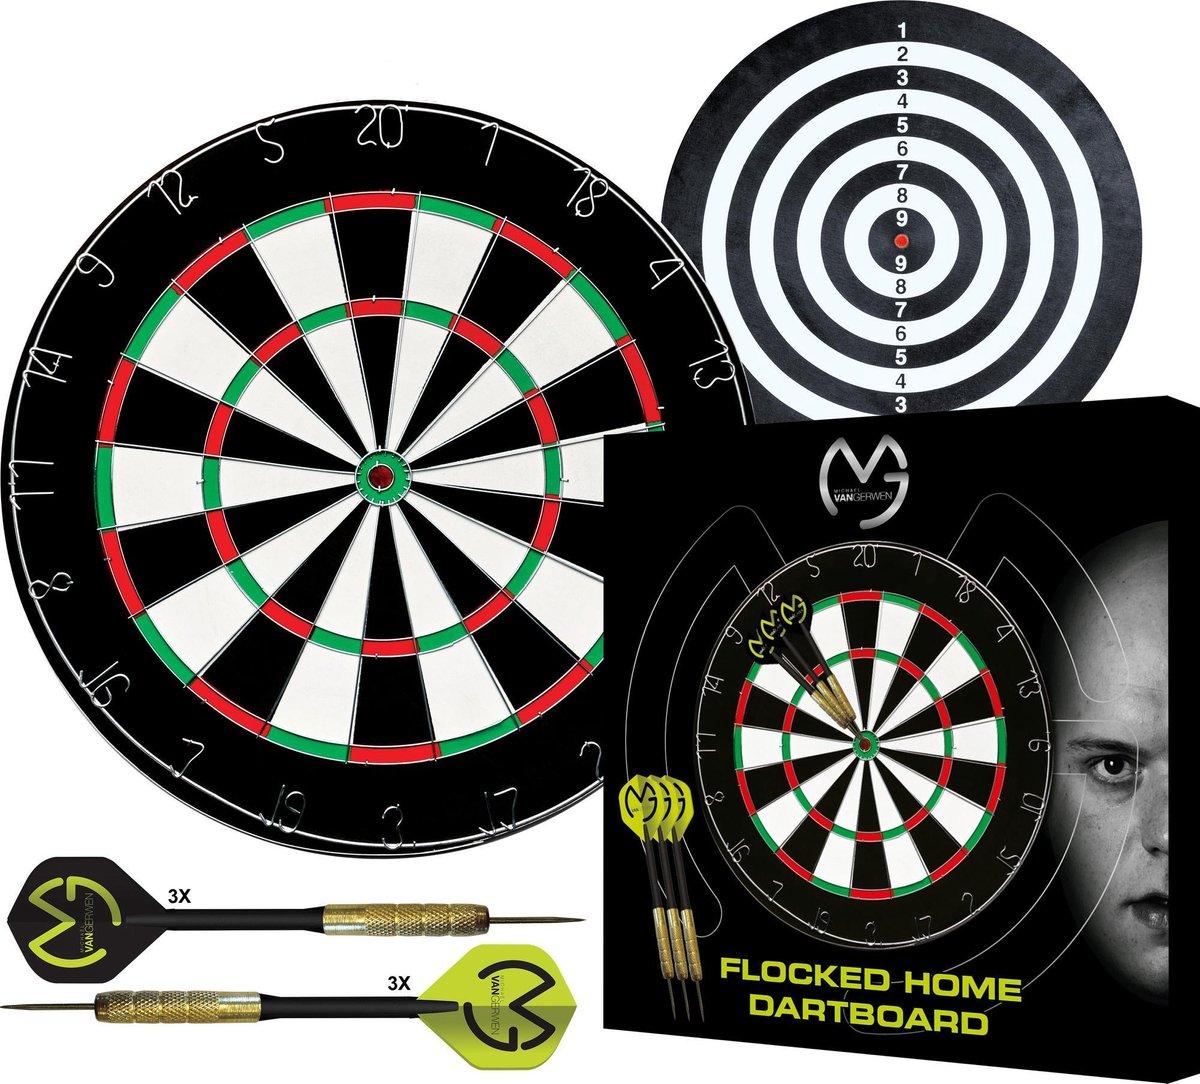 XQ-Max - dartbord - Michael van Gerwen flocked dartbord set - inclusief complete dartpijlen